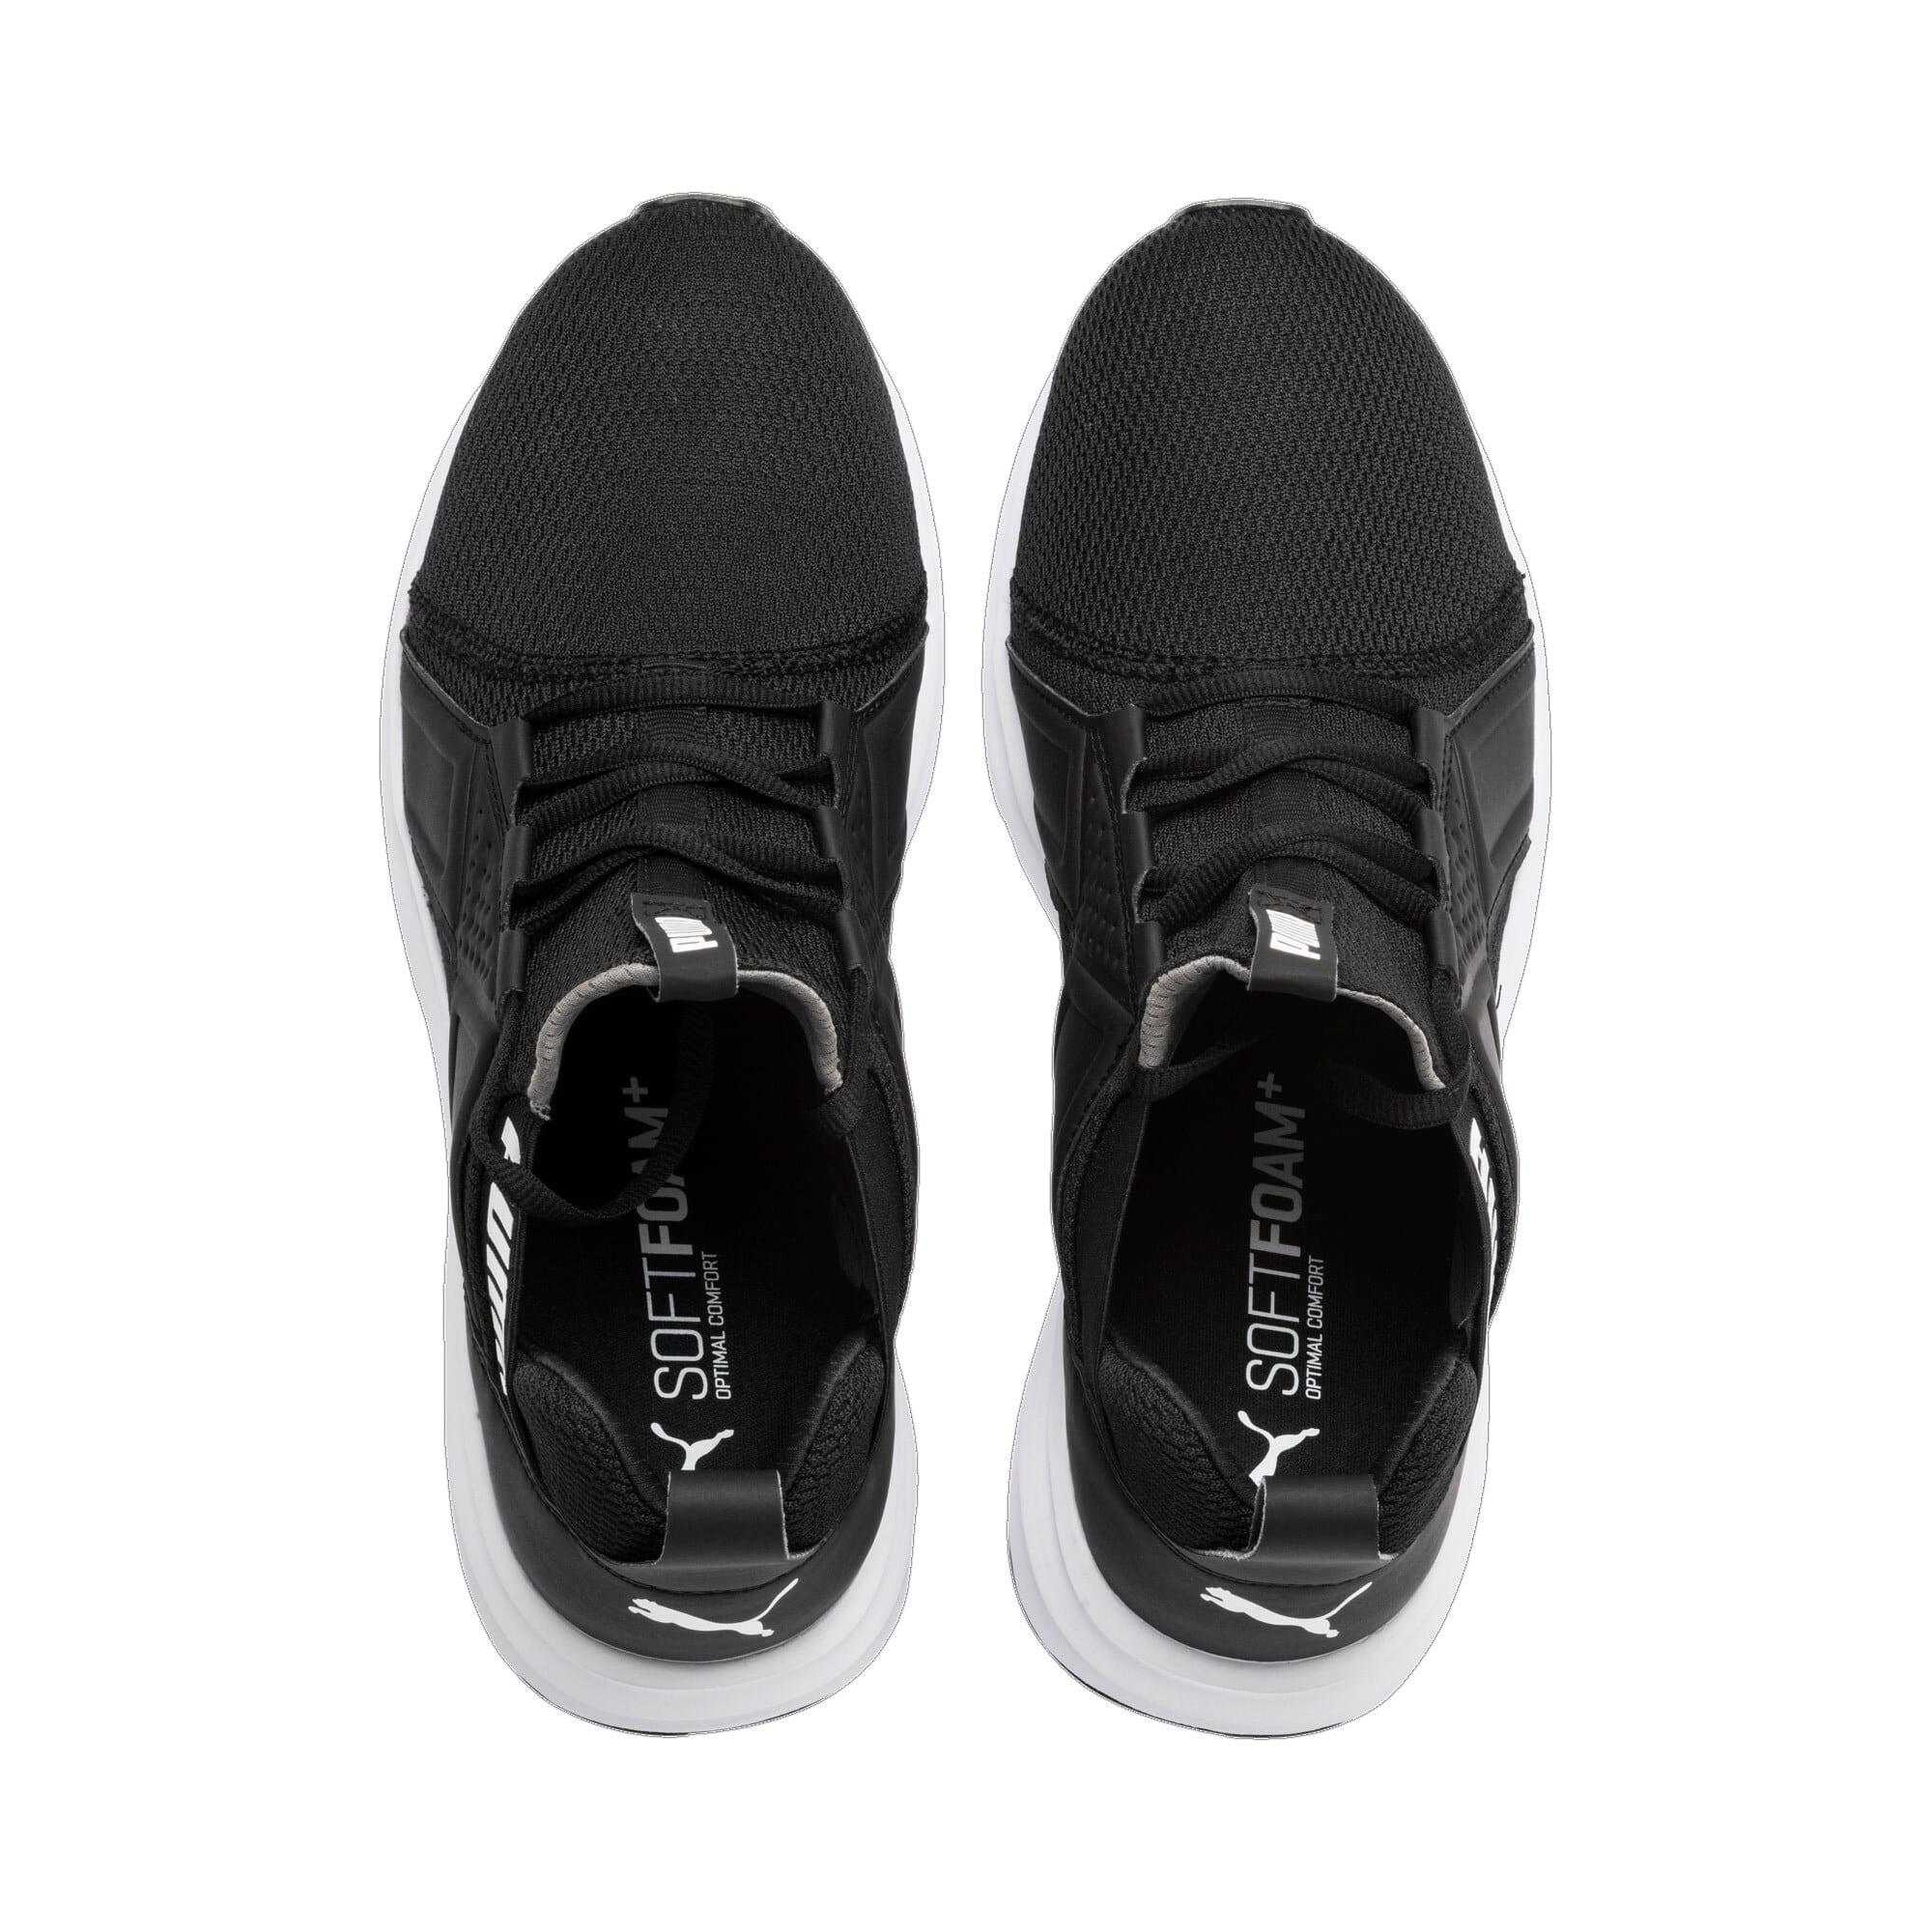 Thumbnail 7 of Enzo Sport Herren Sneaker, Puma Black-Puma White, medium